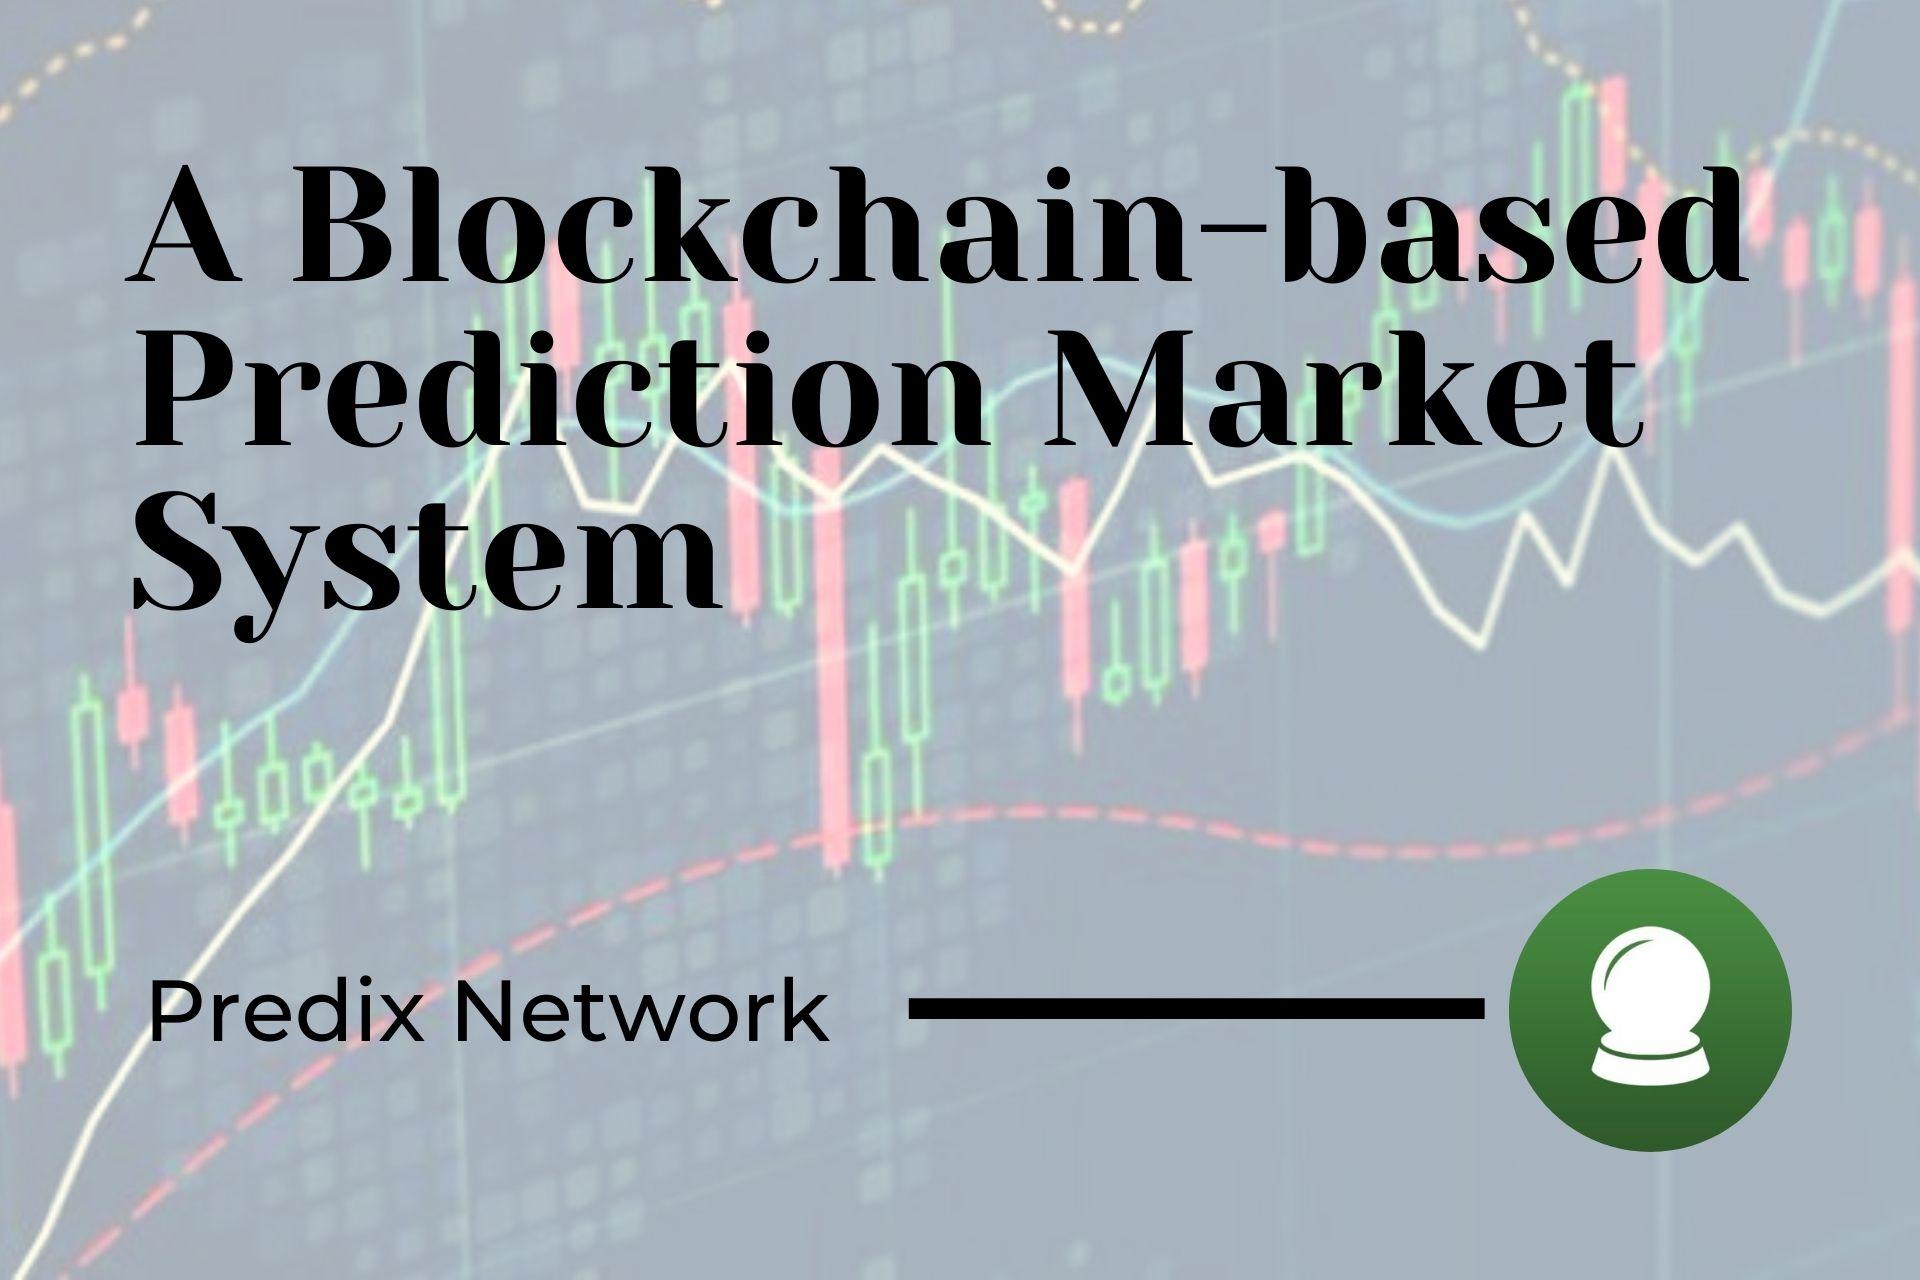 Predix Network: A Blockchain-based Prediction Market System Supporting DEXs Like Uniswap